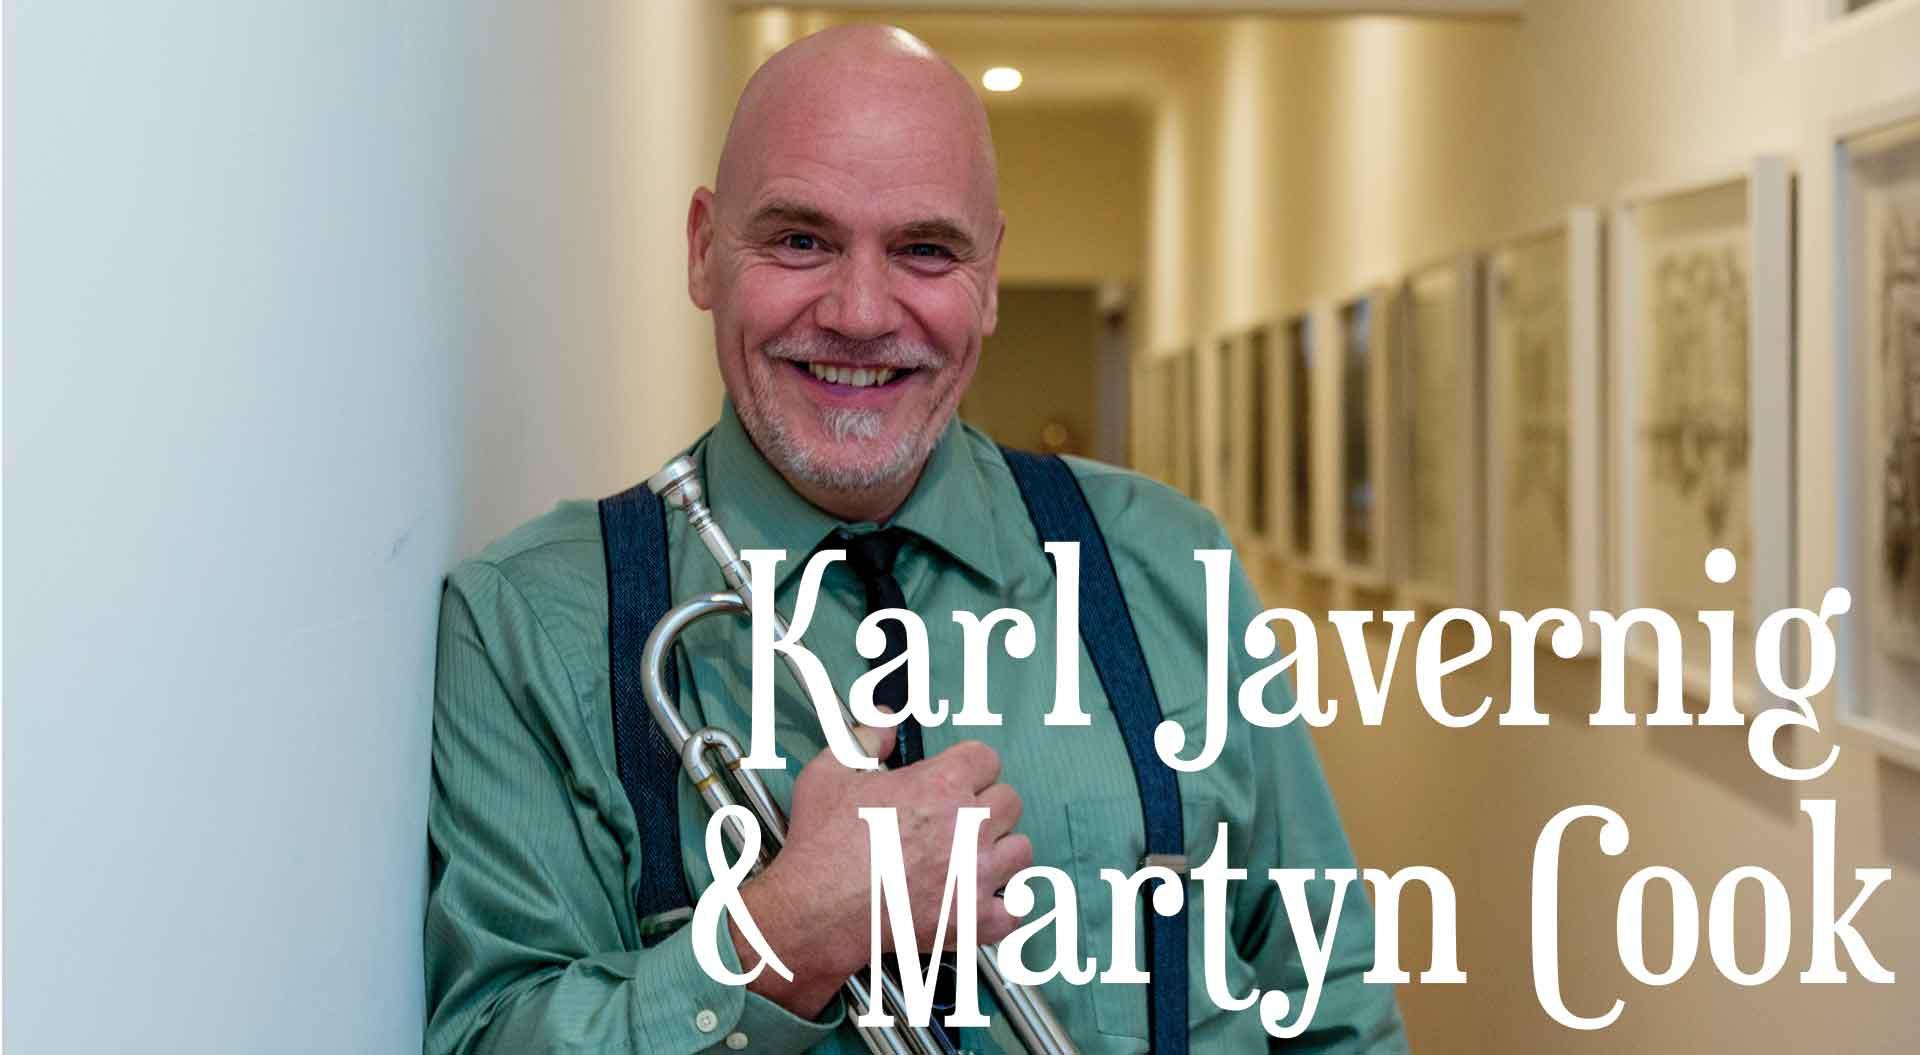 Karl Javernig & Martyn Cook   Nombre 230   Palais Royale Hotel